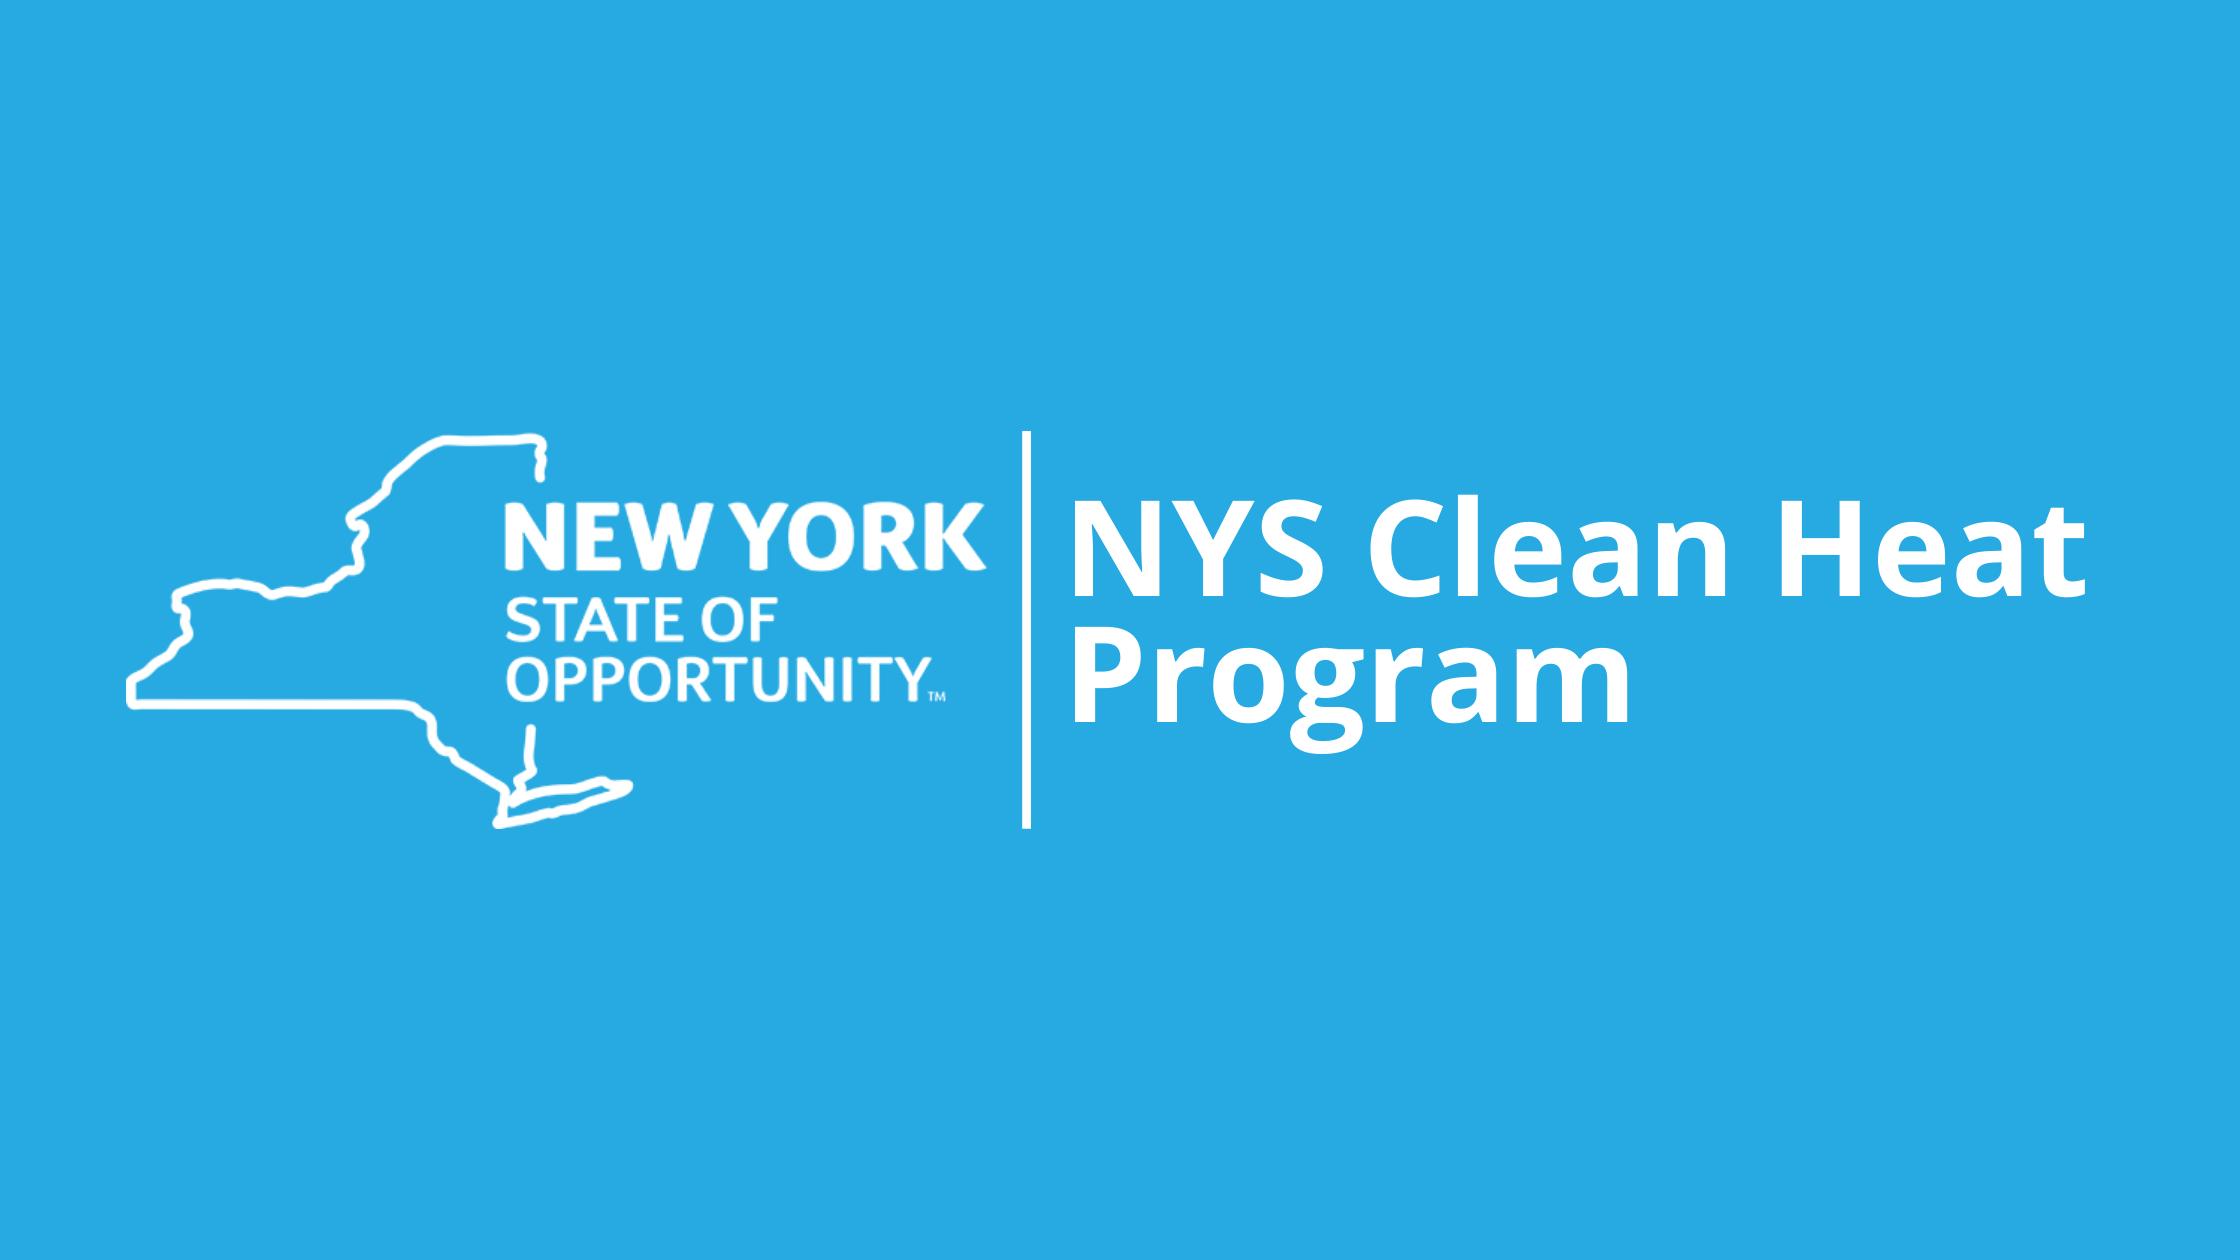 NYS Clean Heat Program